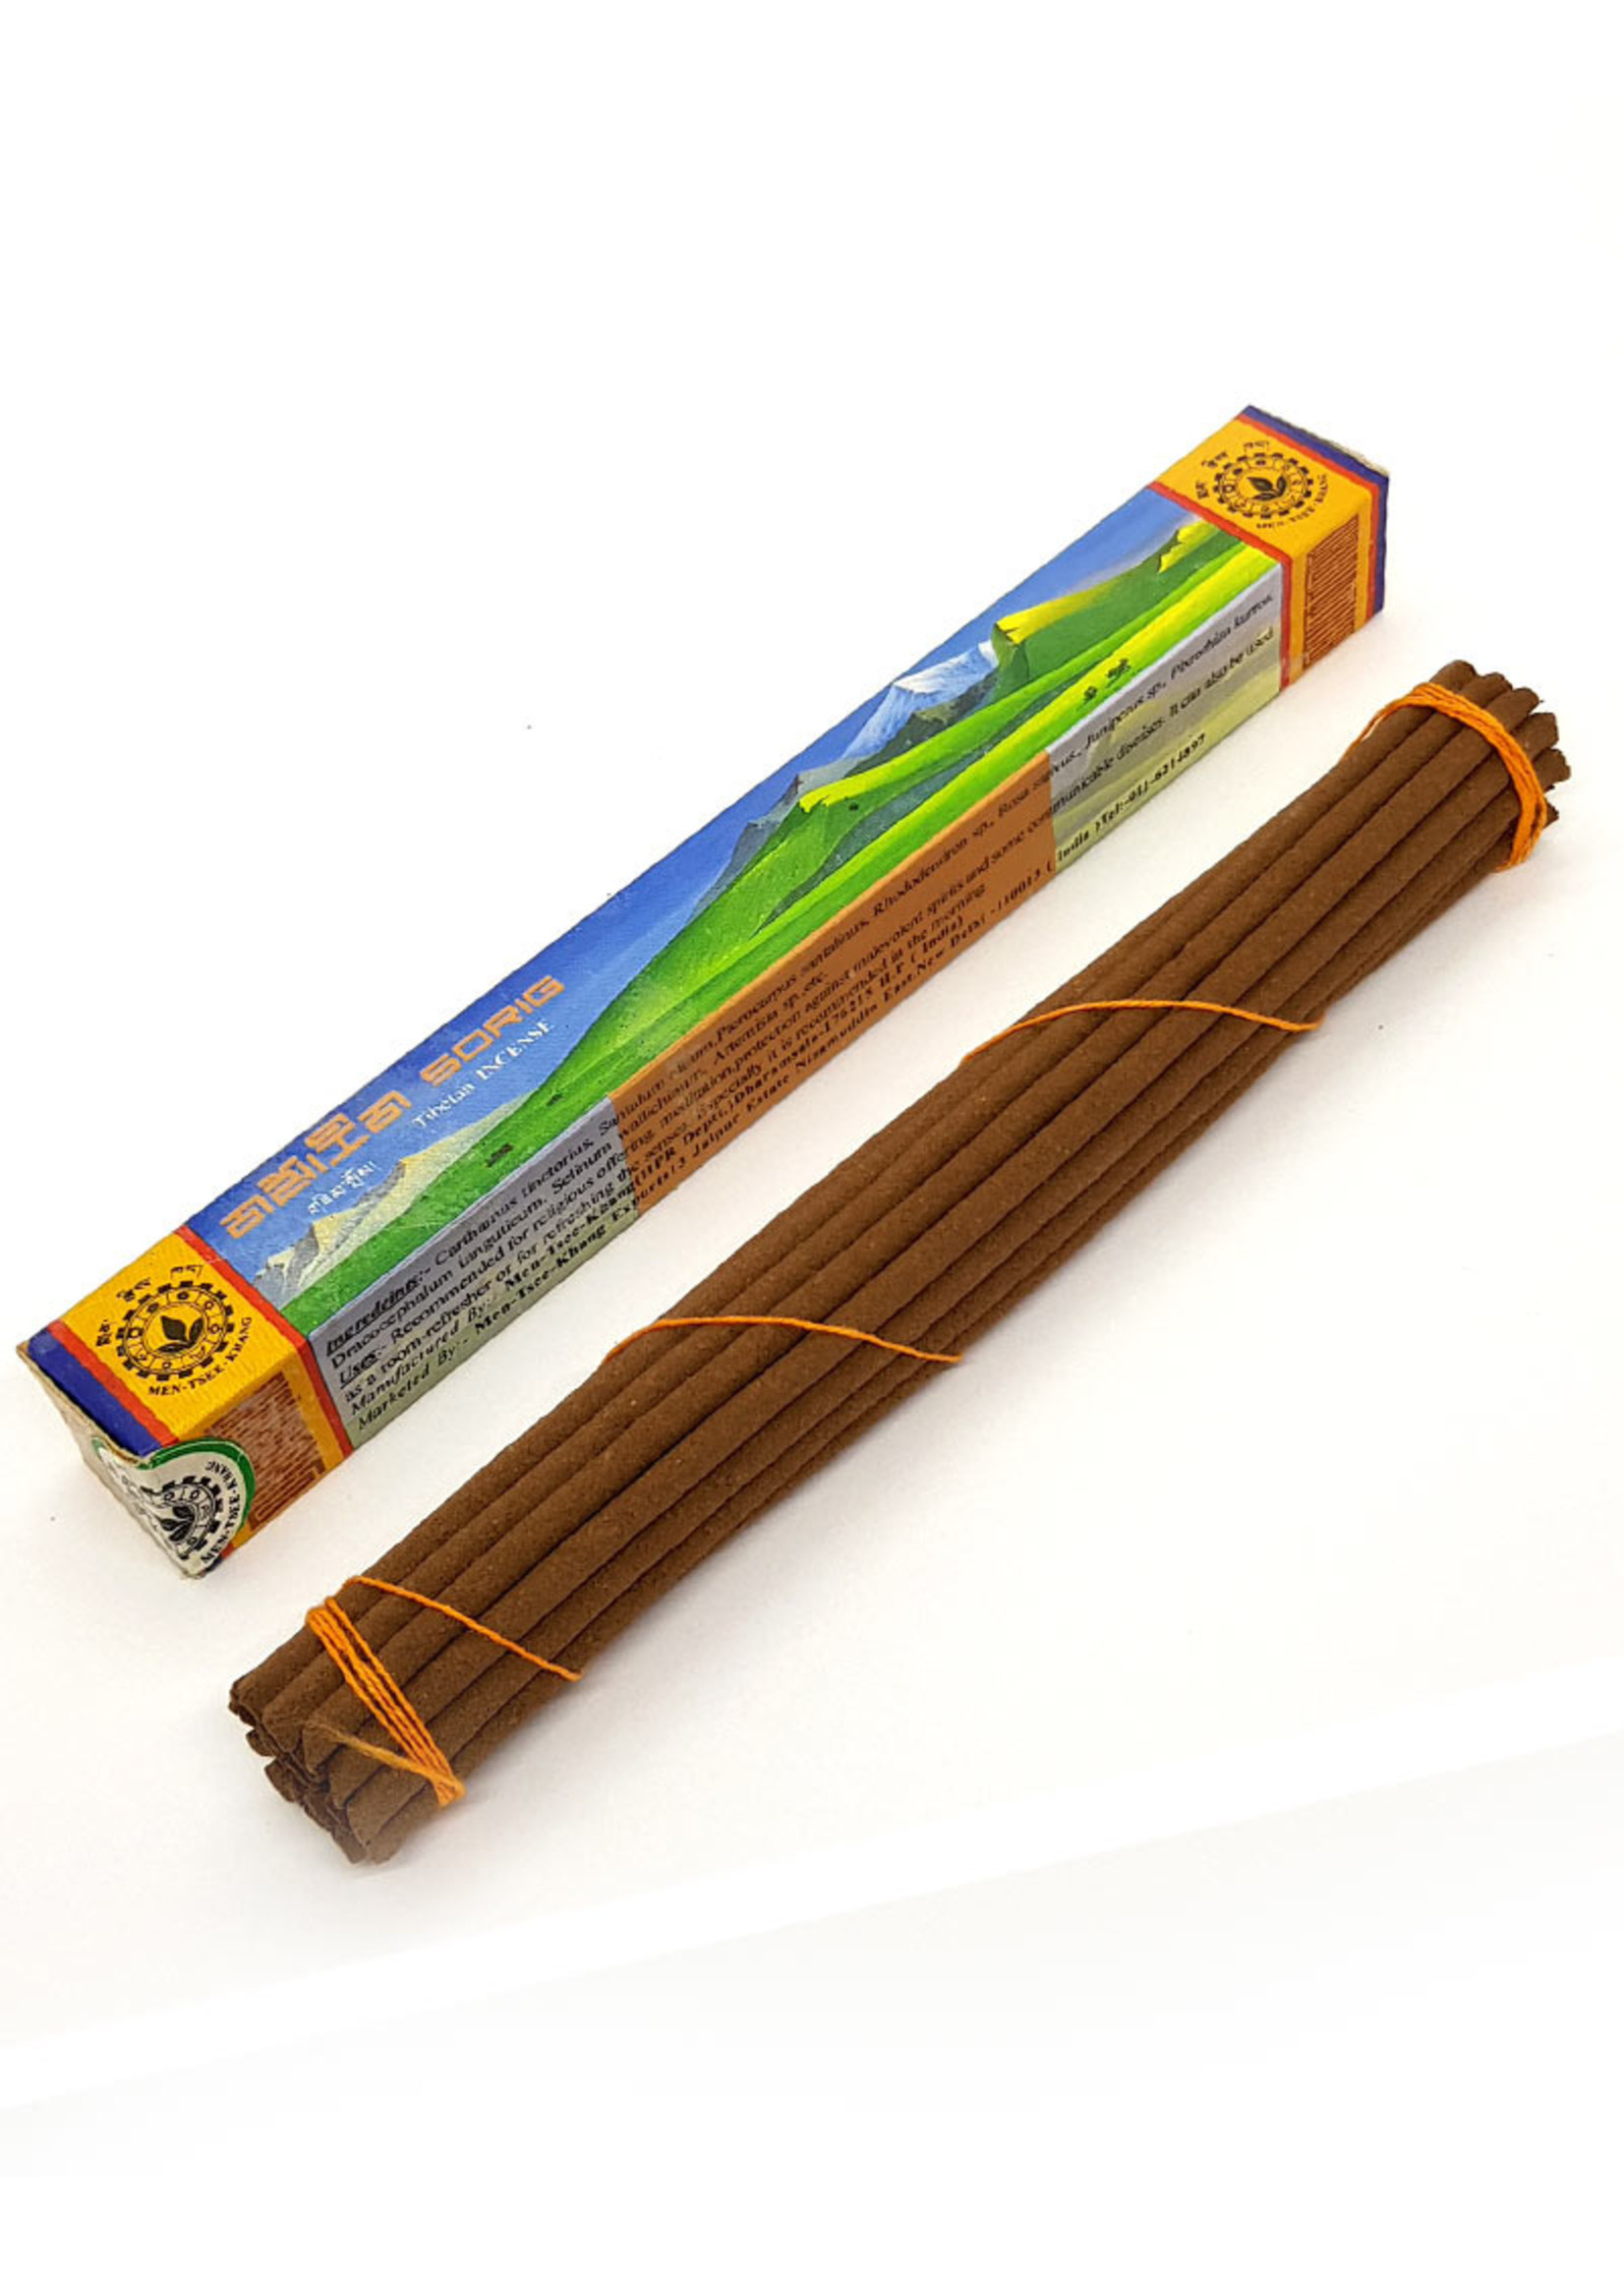 Tibetische Räucherstäbchen Sorig Tibetan Incense